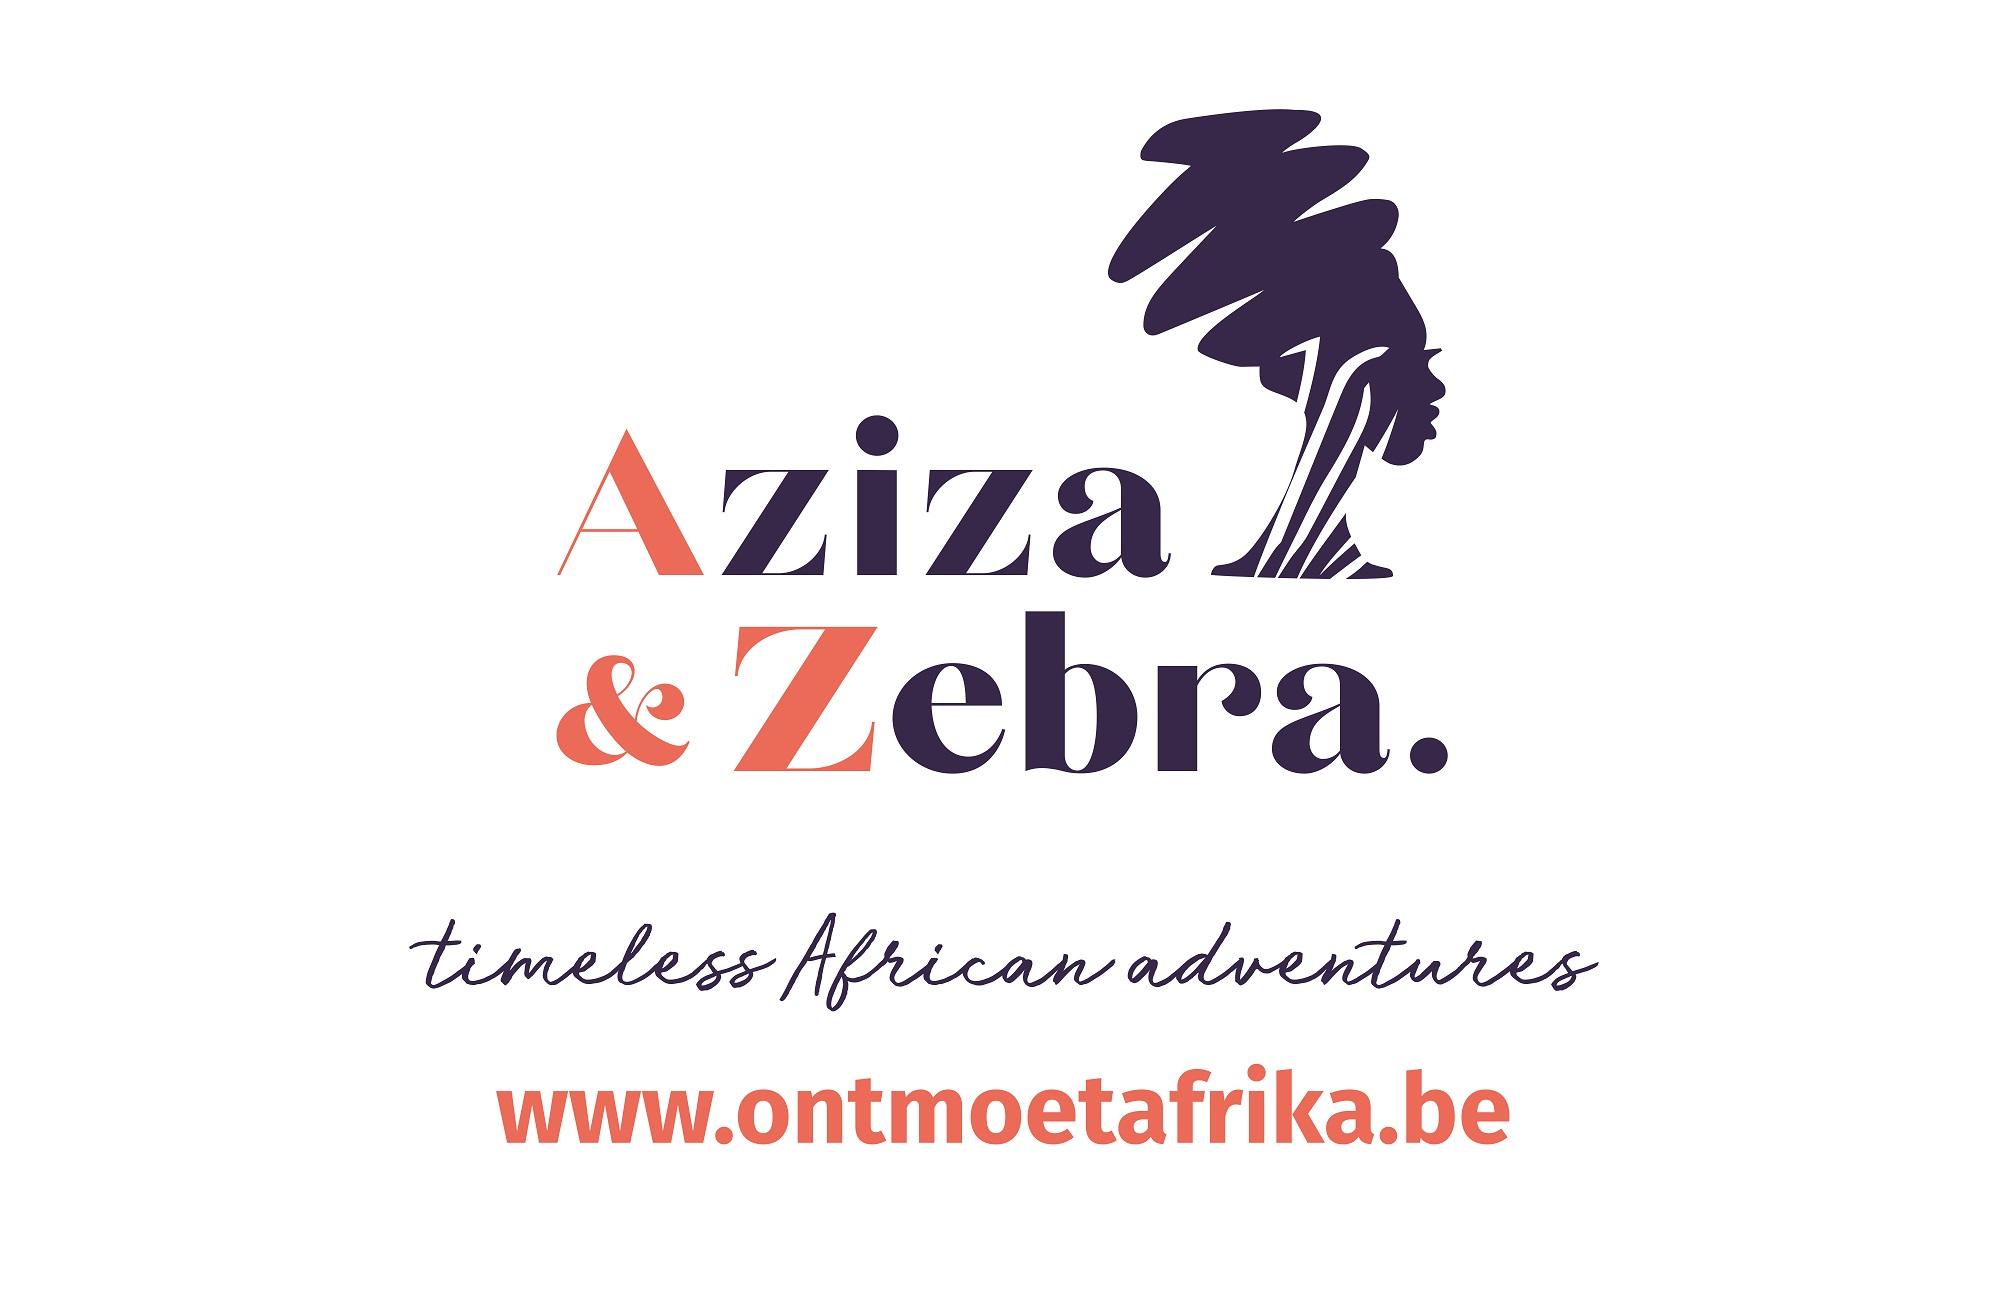 Ontmoet-Afrika-_-Aziza-Zebra-_-timeless-African-adventures-_-promobeeld